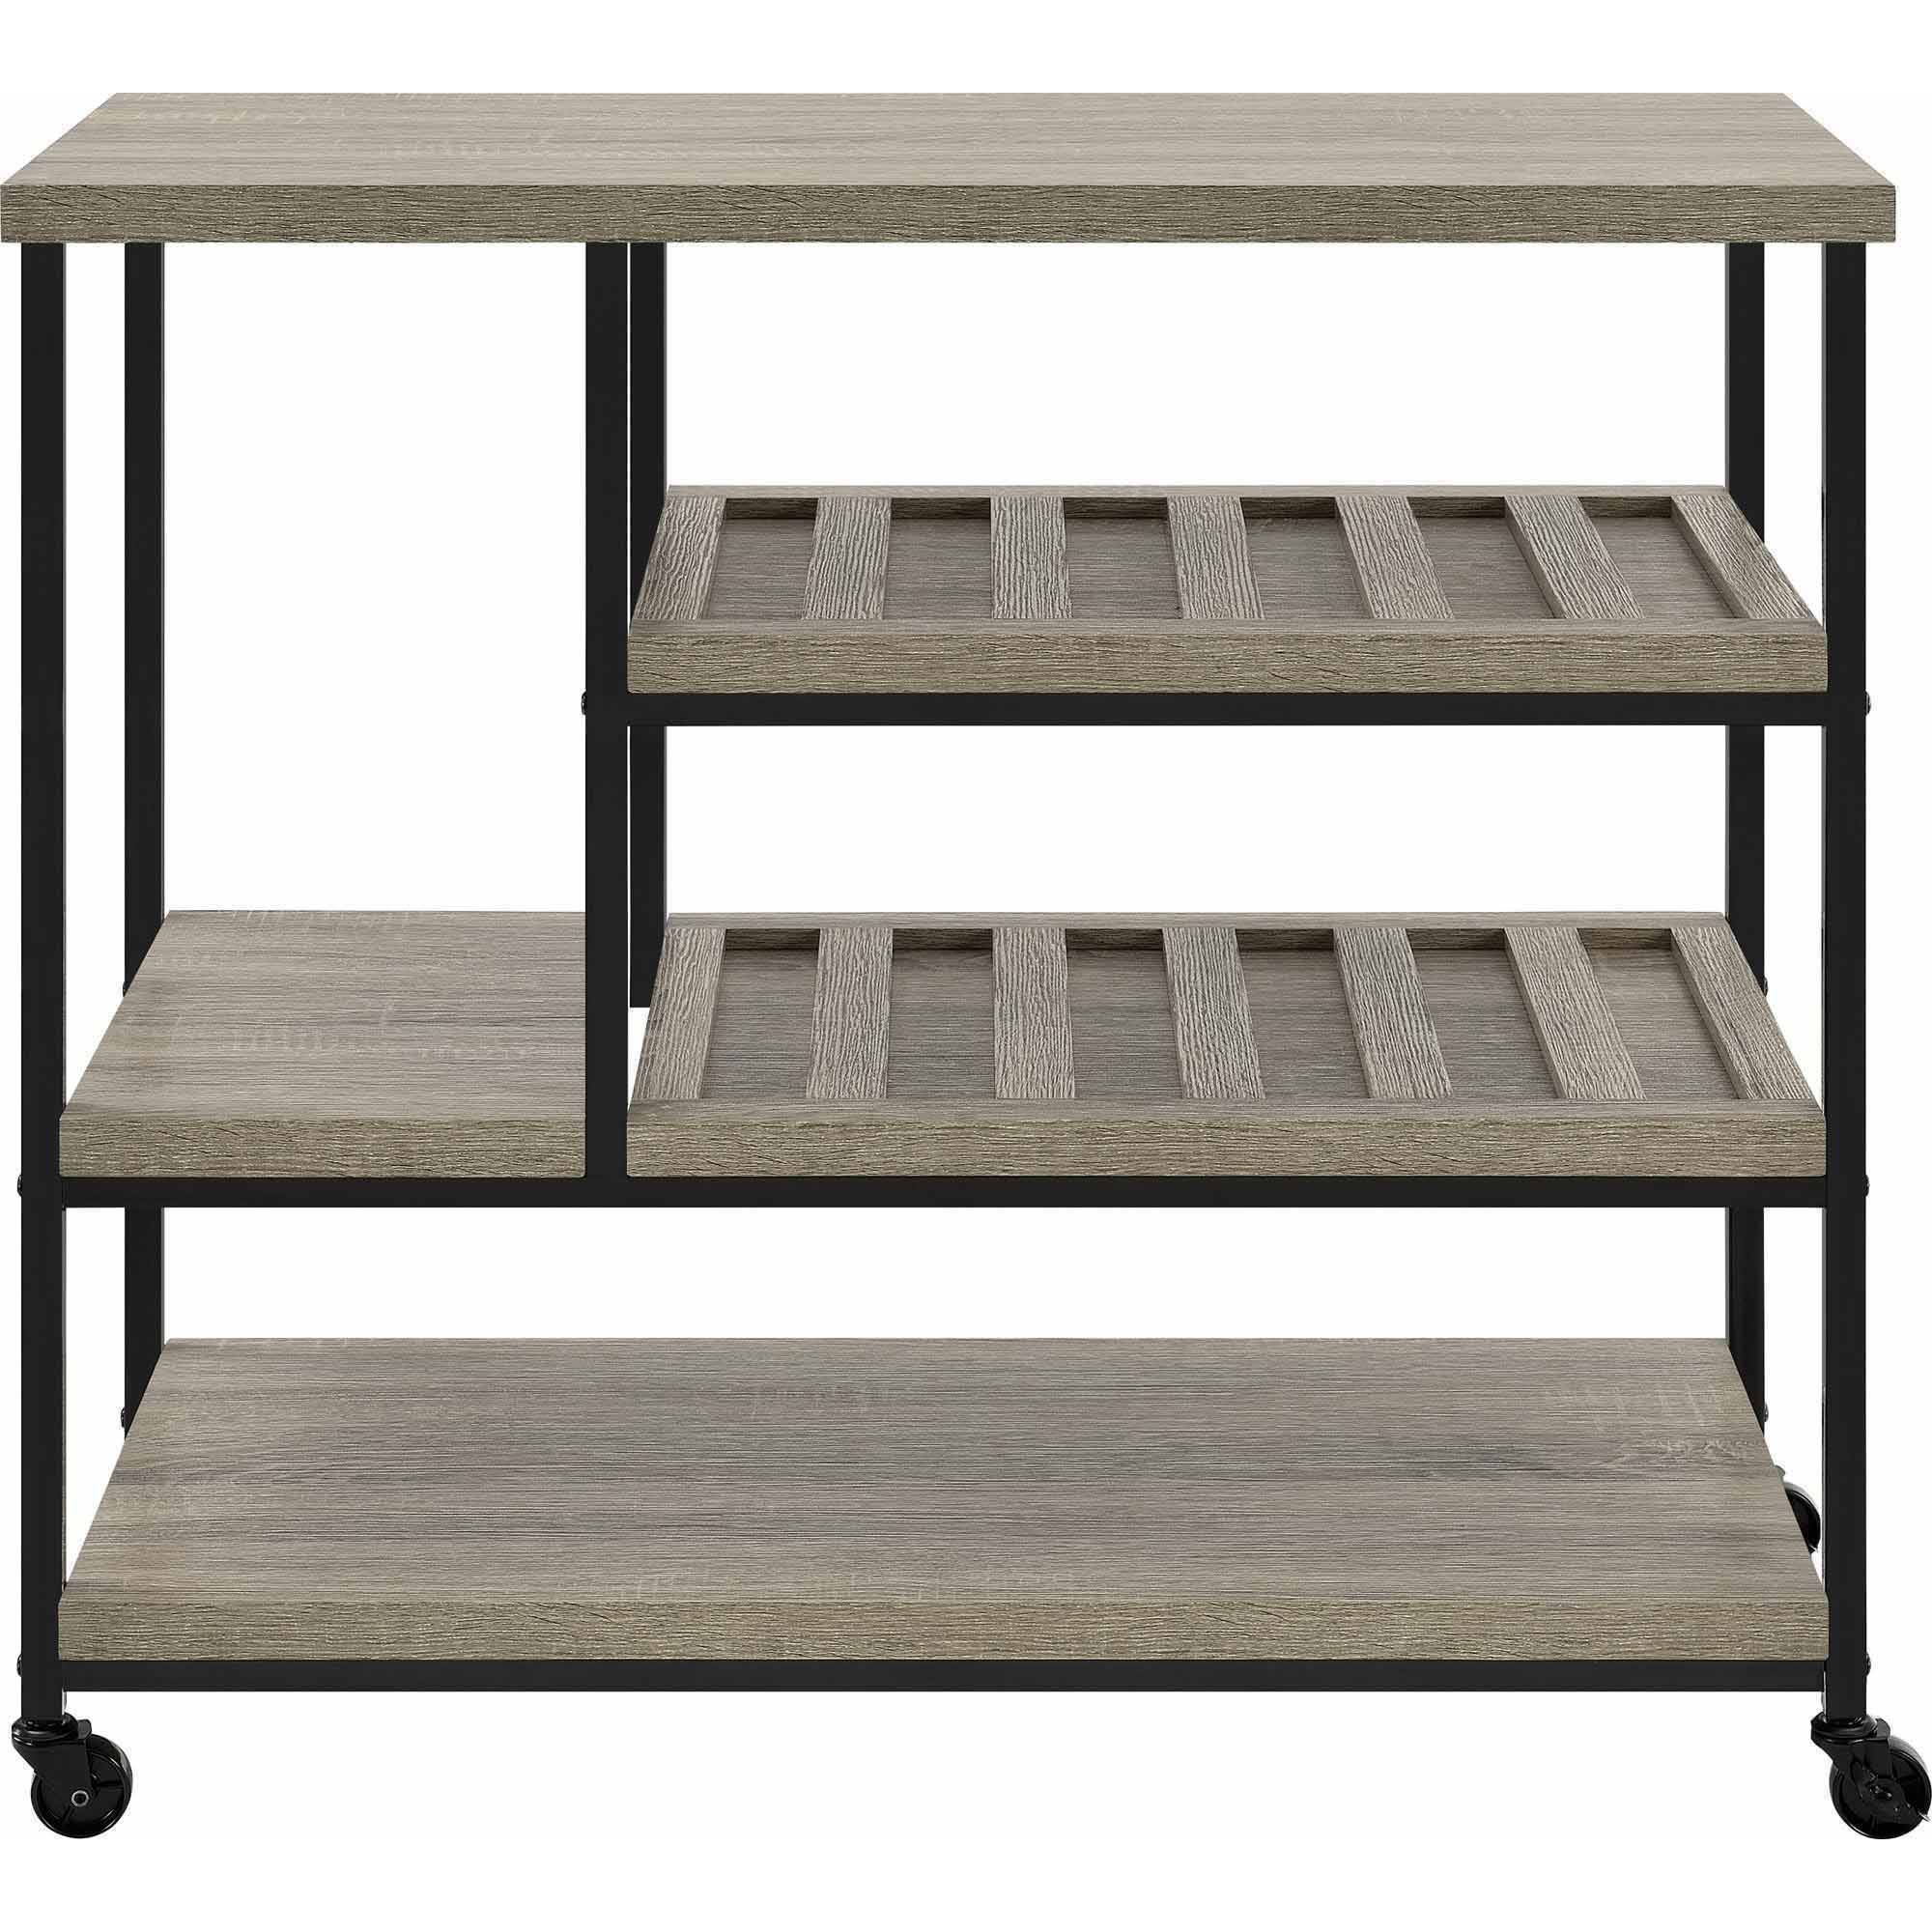 Elmwood Multi-Purpose Cart, Sonoma Oak - Walmart.com